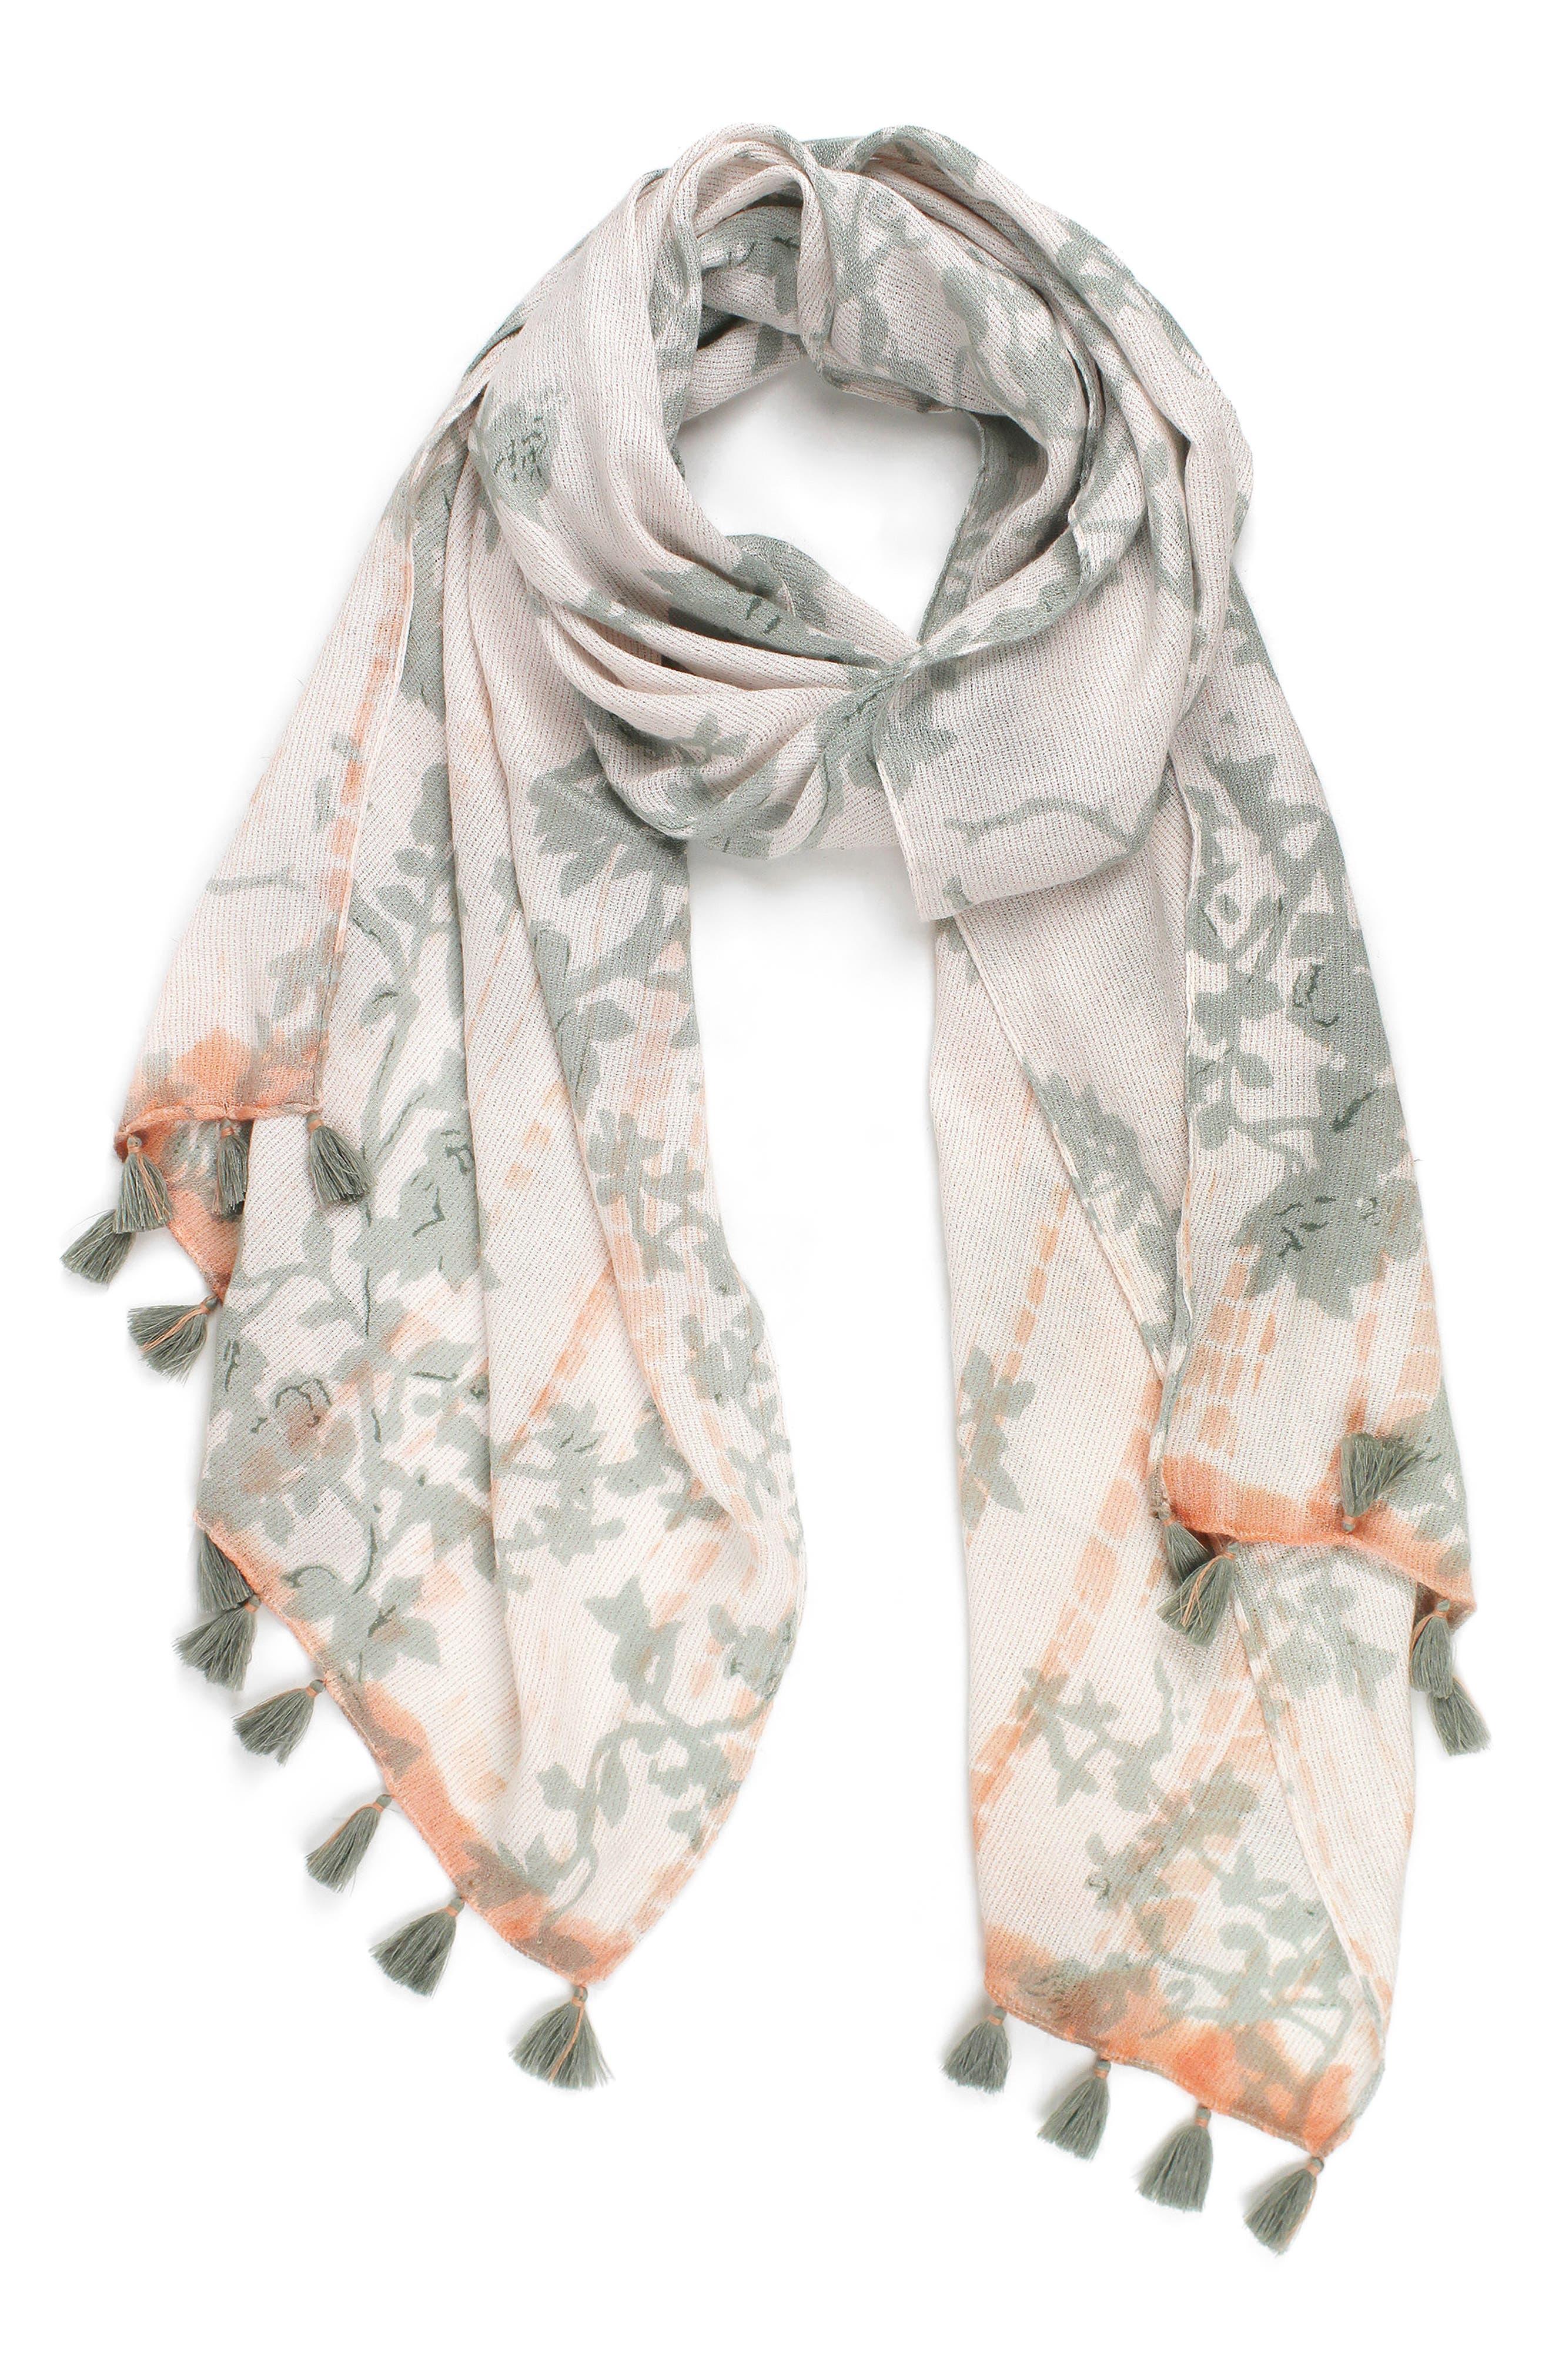 Tie Dye Garden Scarf,                         Main,                         color, Oyster Grey/ White